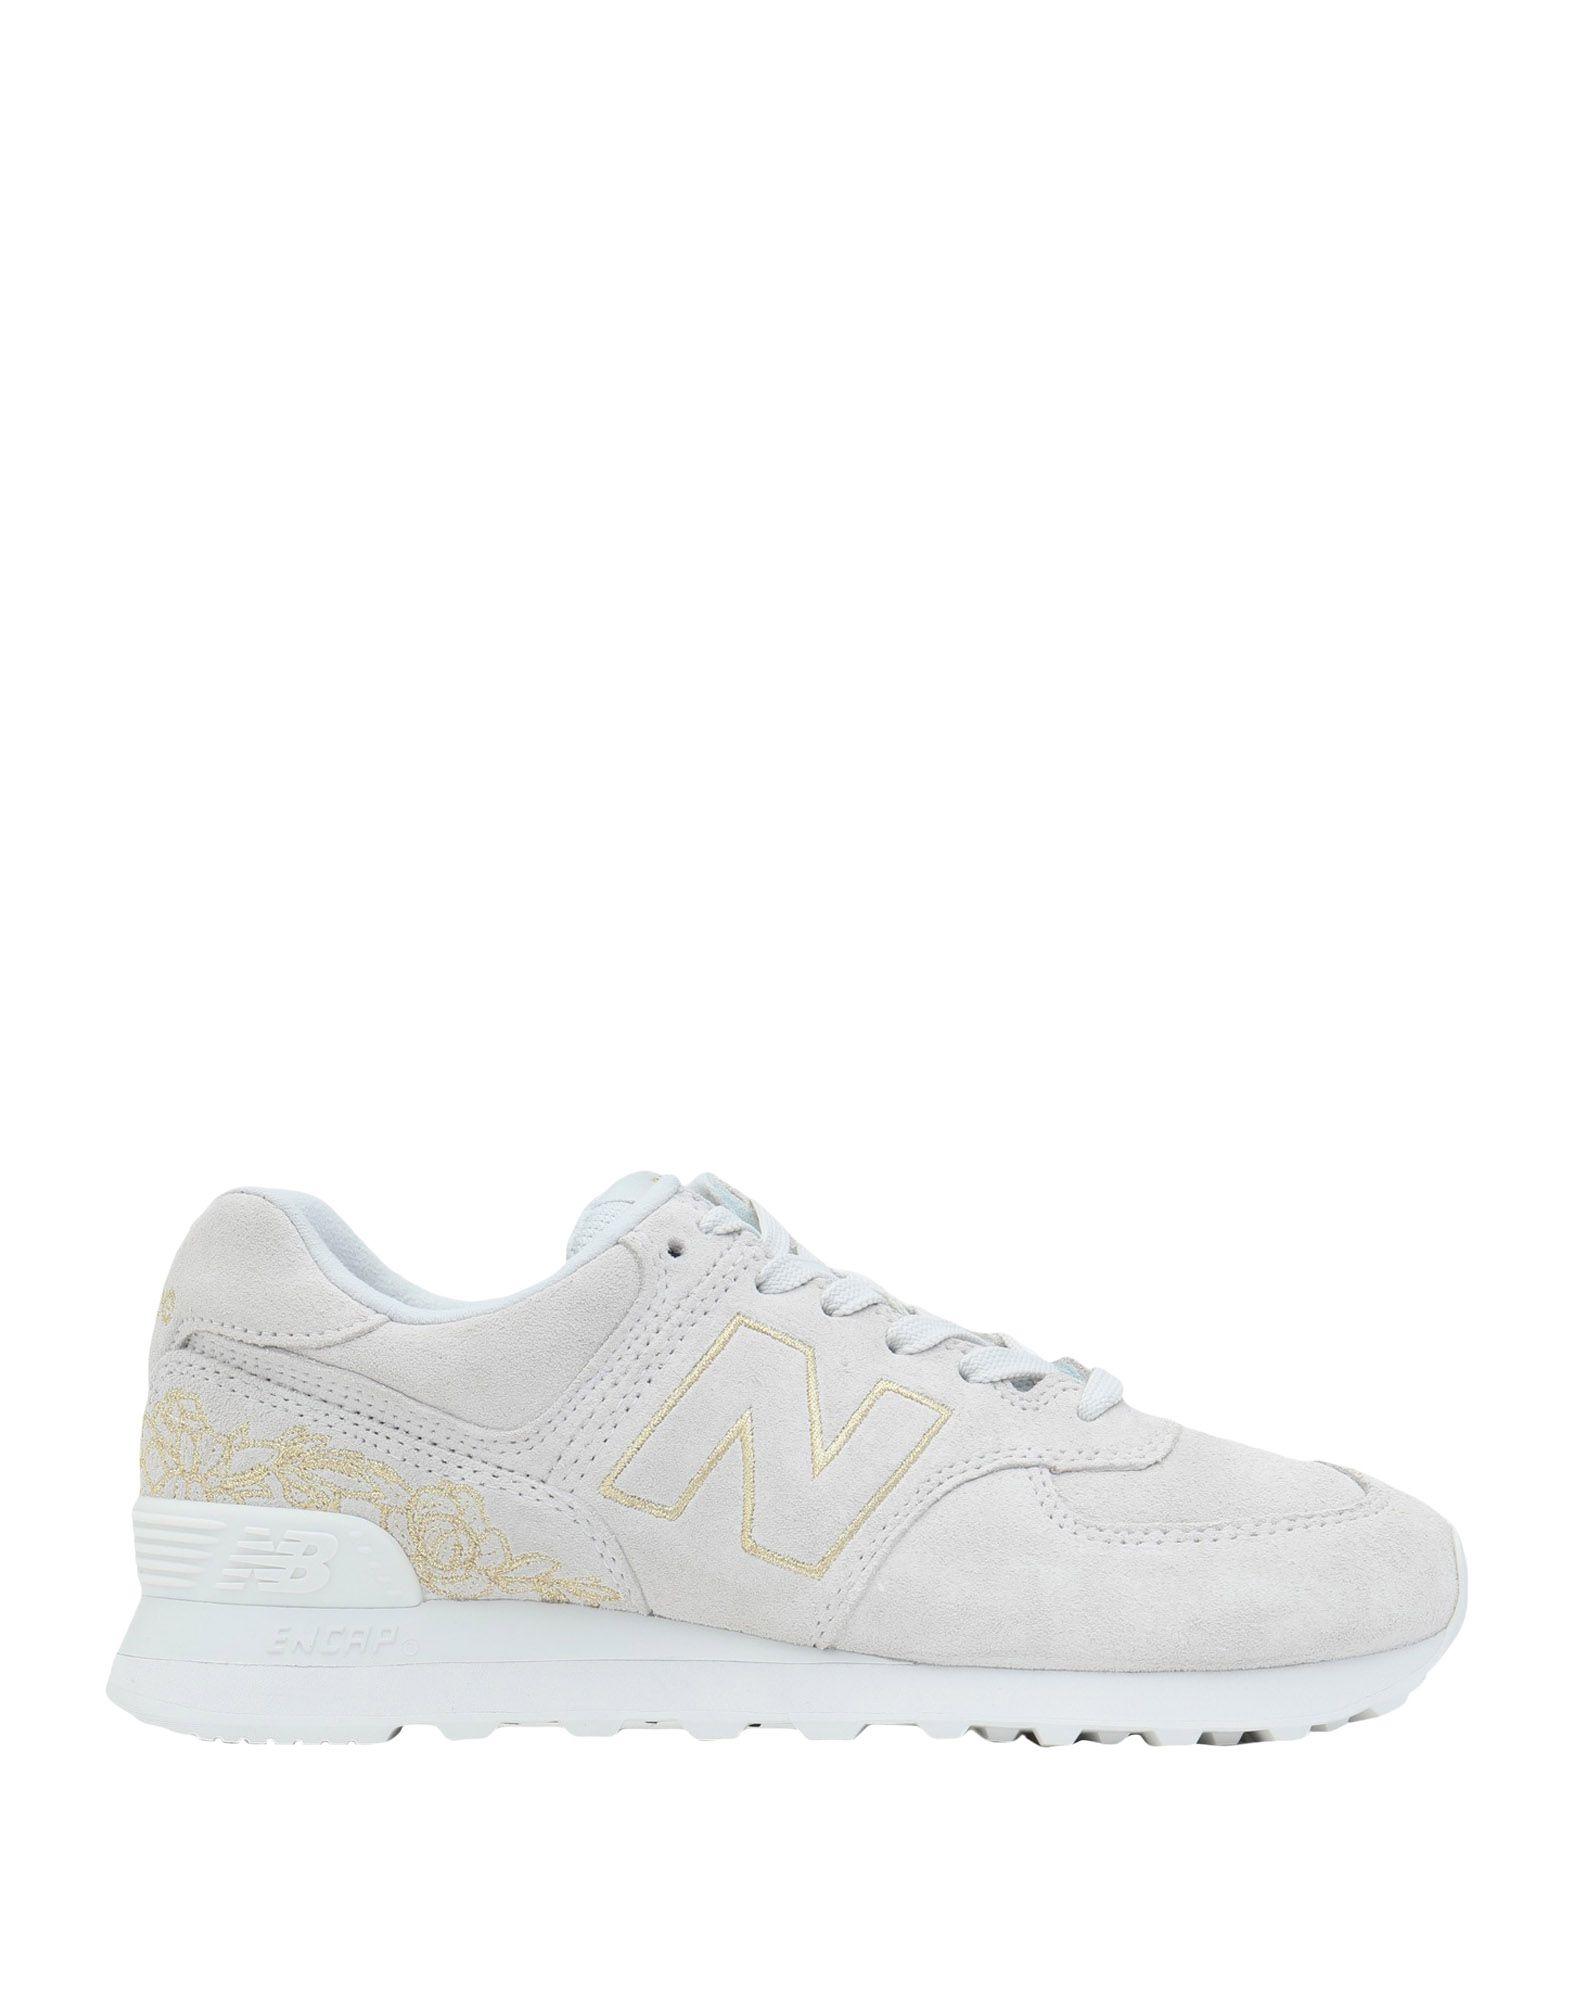 New Balance Sneakers - Women on New Balance Sneakers online on Women  Australia - 11567767NO f8aa11